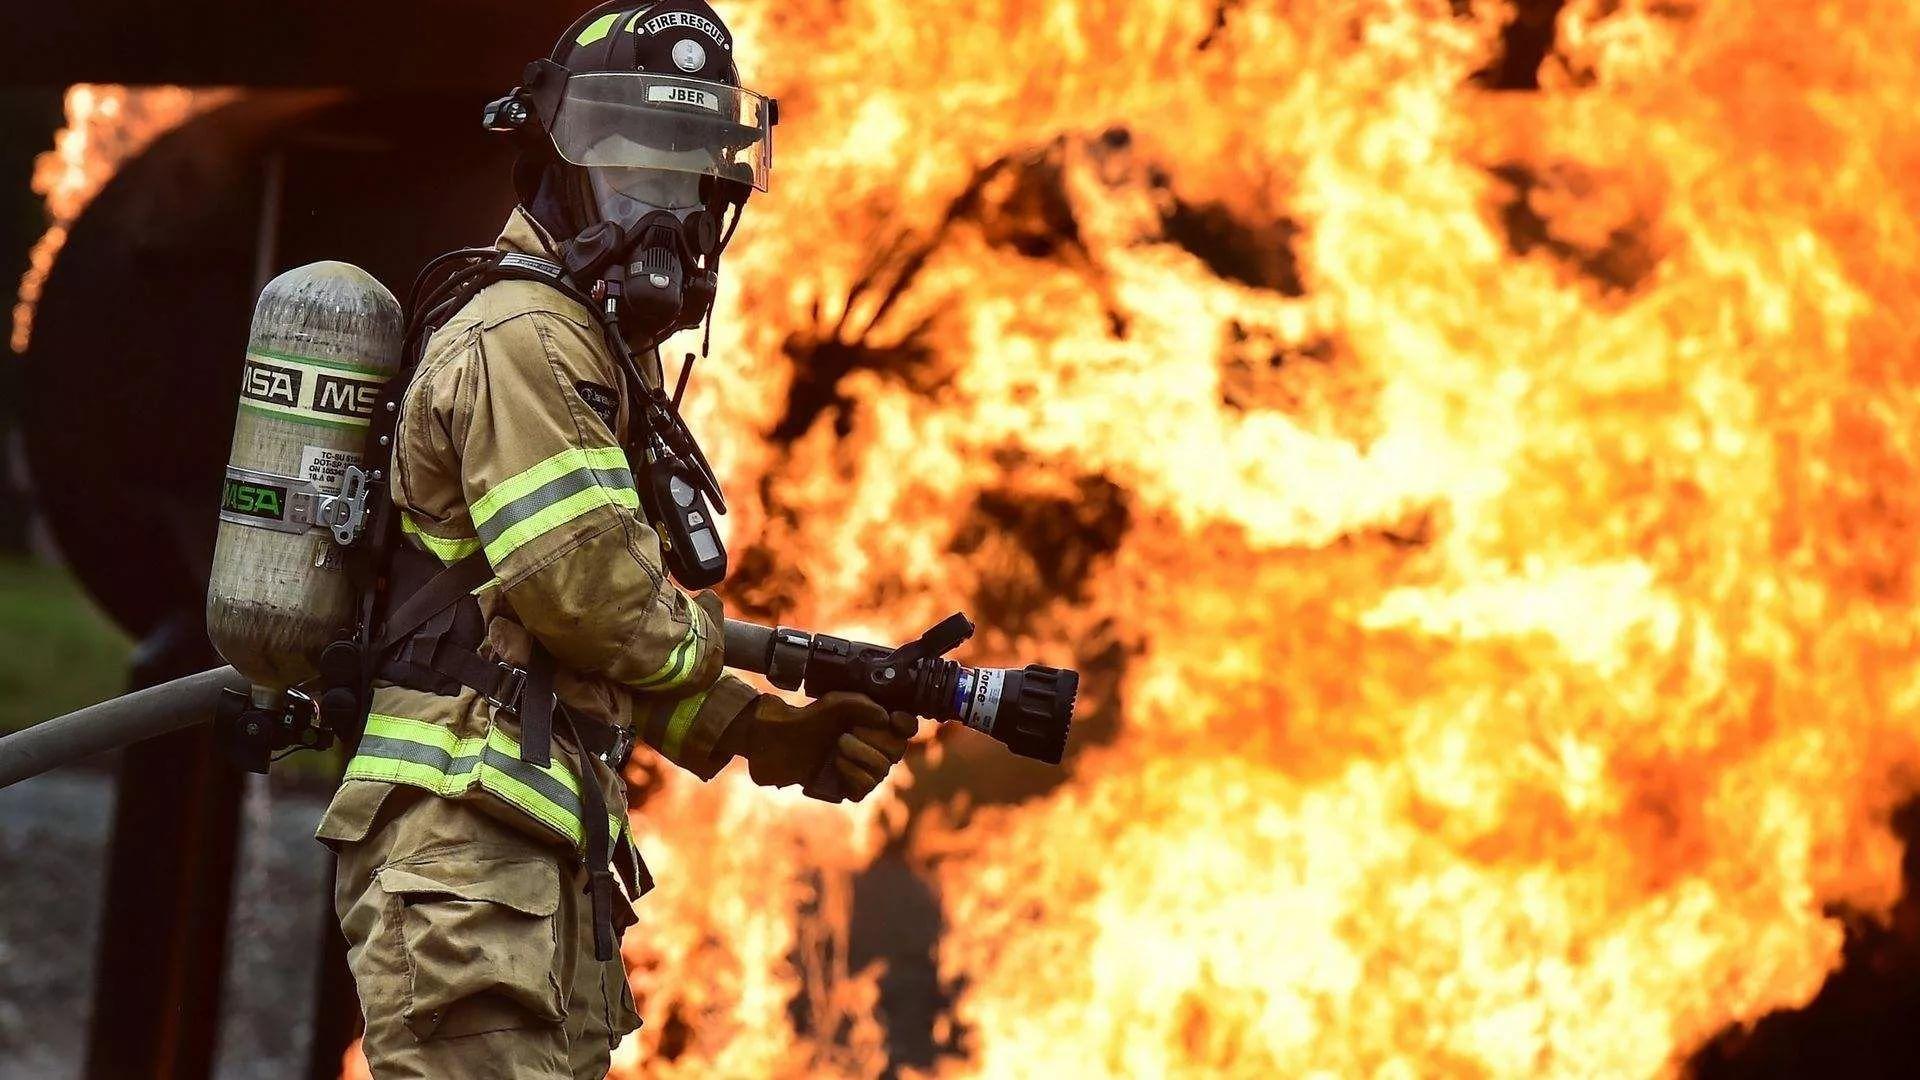 Firefighter PC Wallpaper